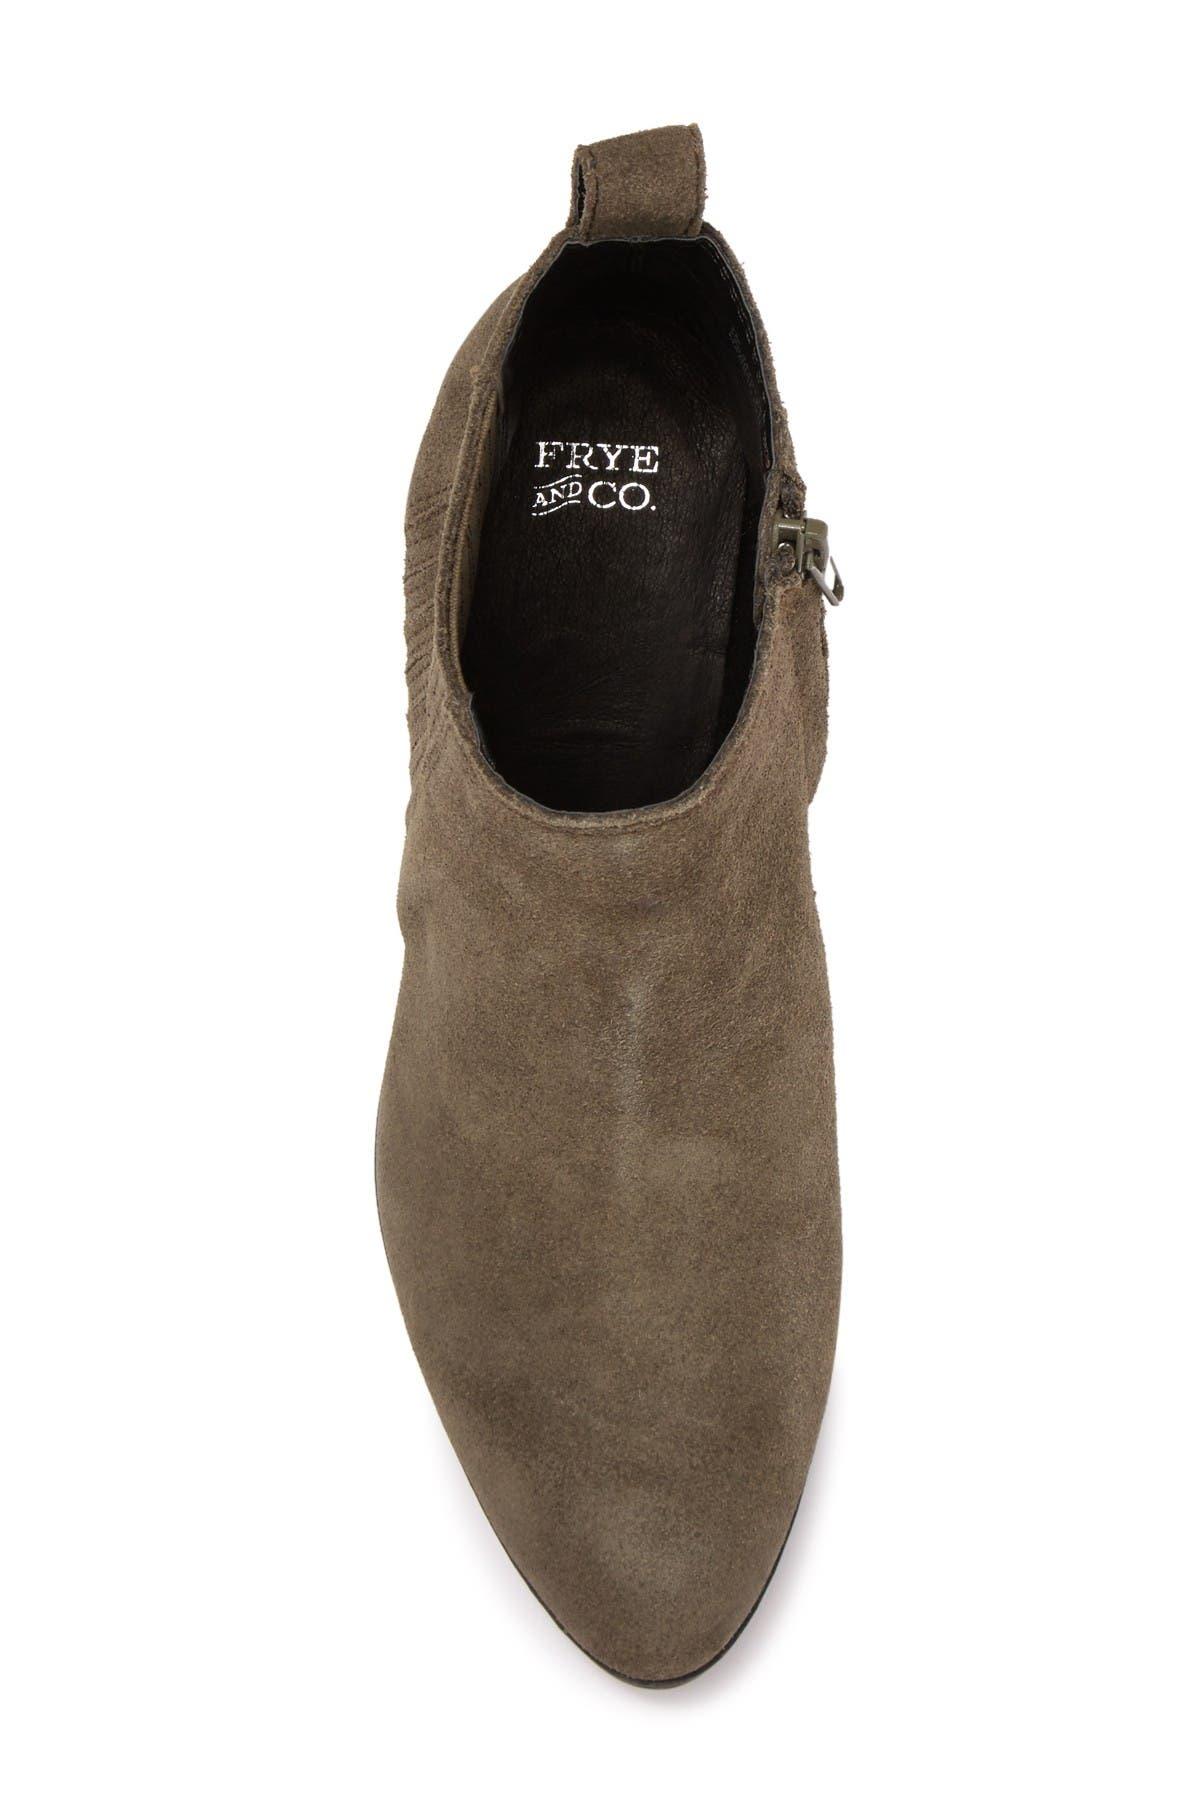 Frye & Co Jacy Suede Chelsea Boot